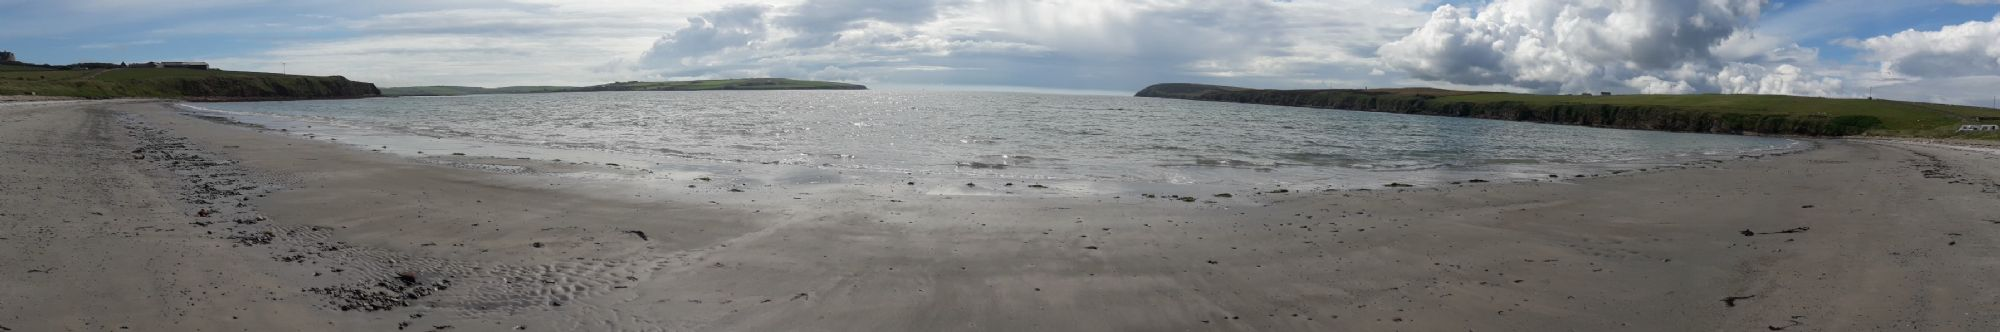 Bay on South Ronaldsay